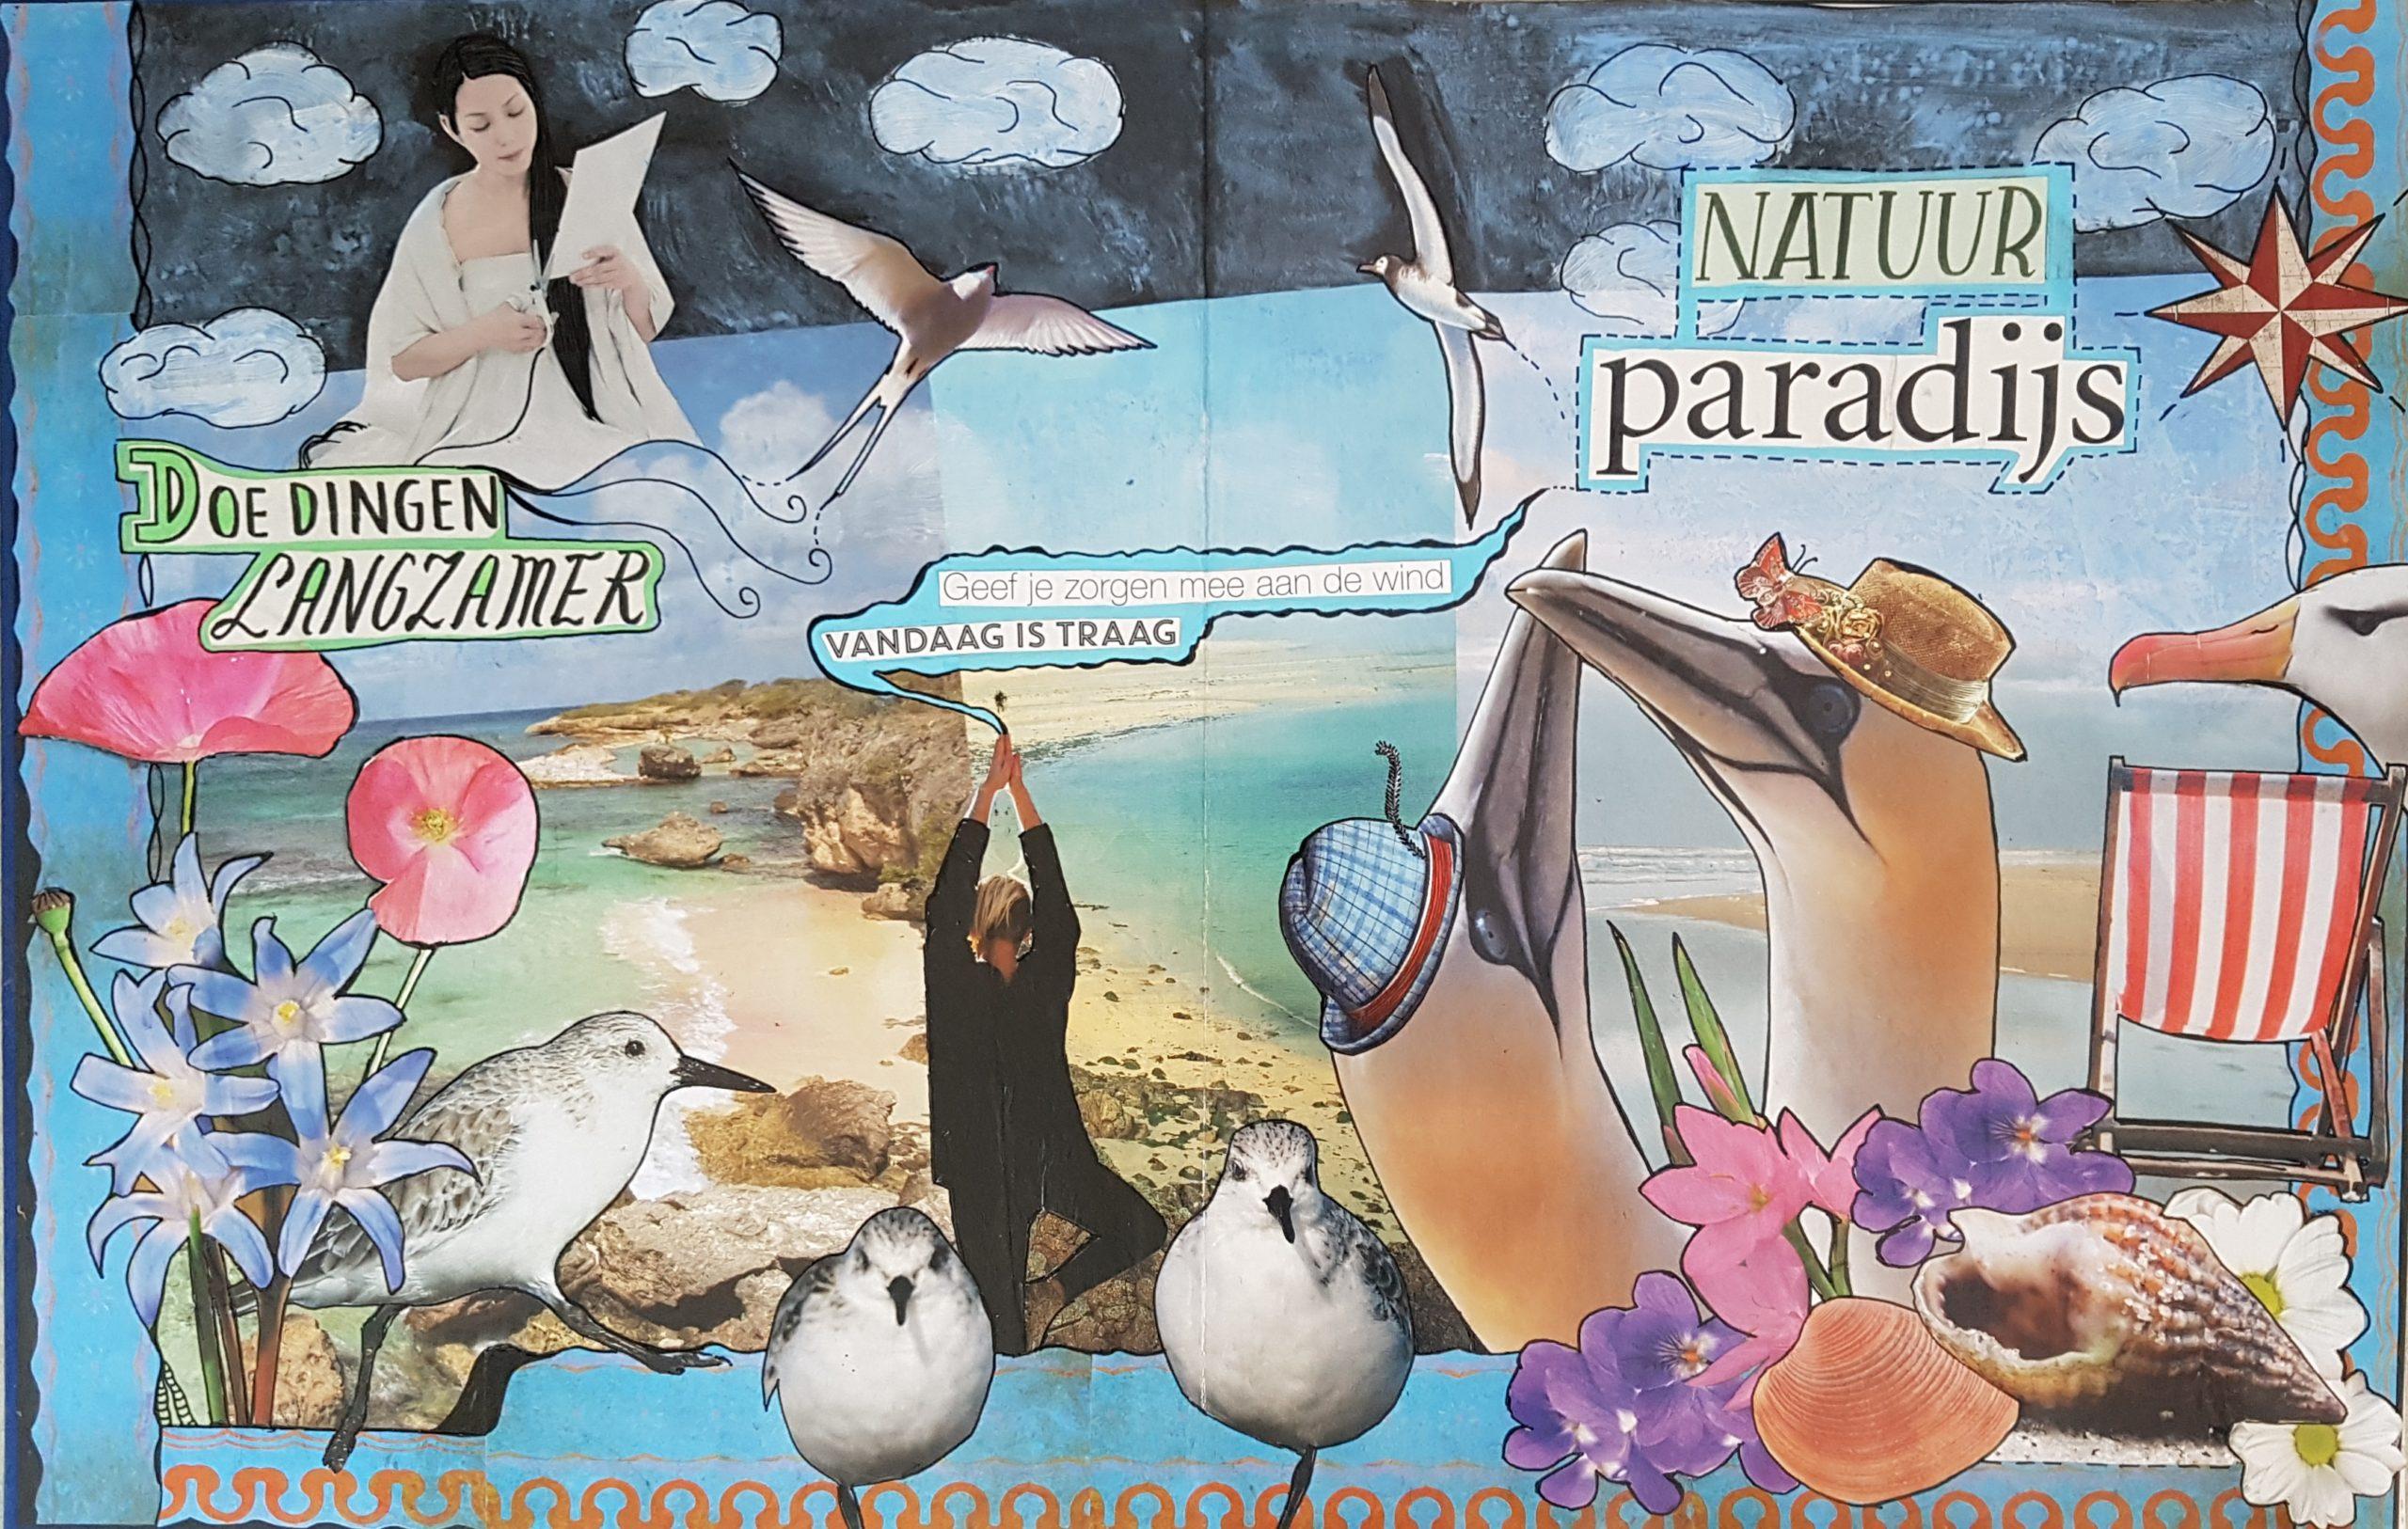 2020 06 17 Natuur Paradijs (2)